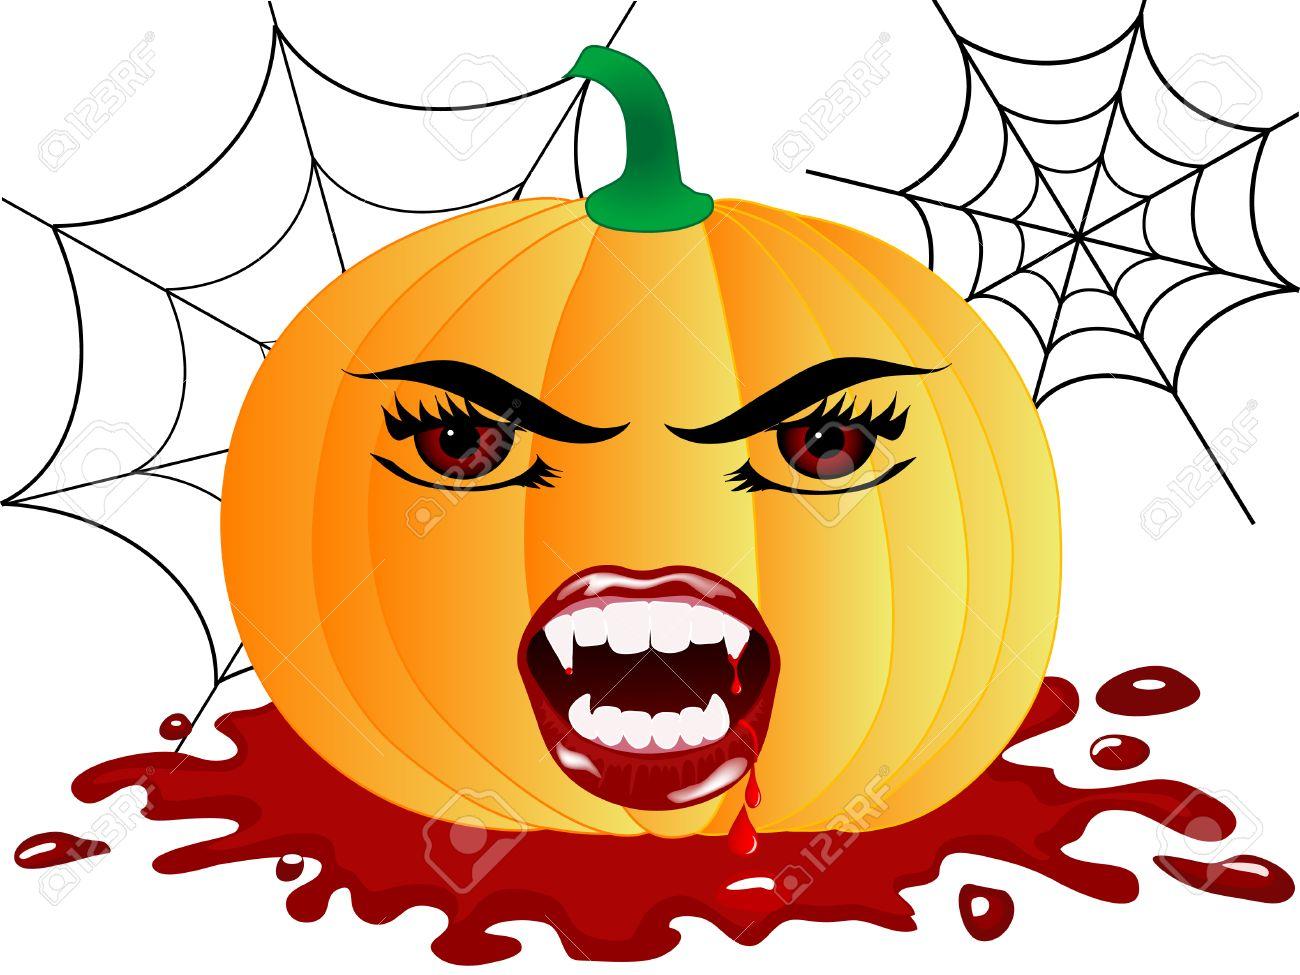 Halloween Pumpkin With Vampire Face